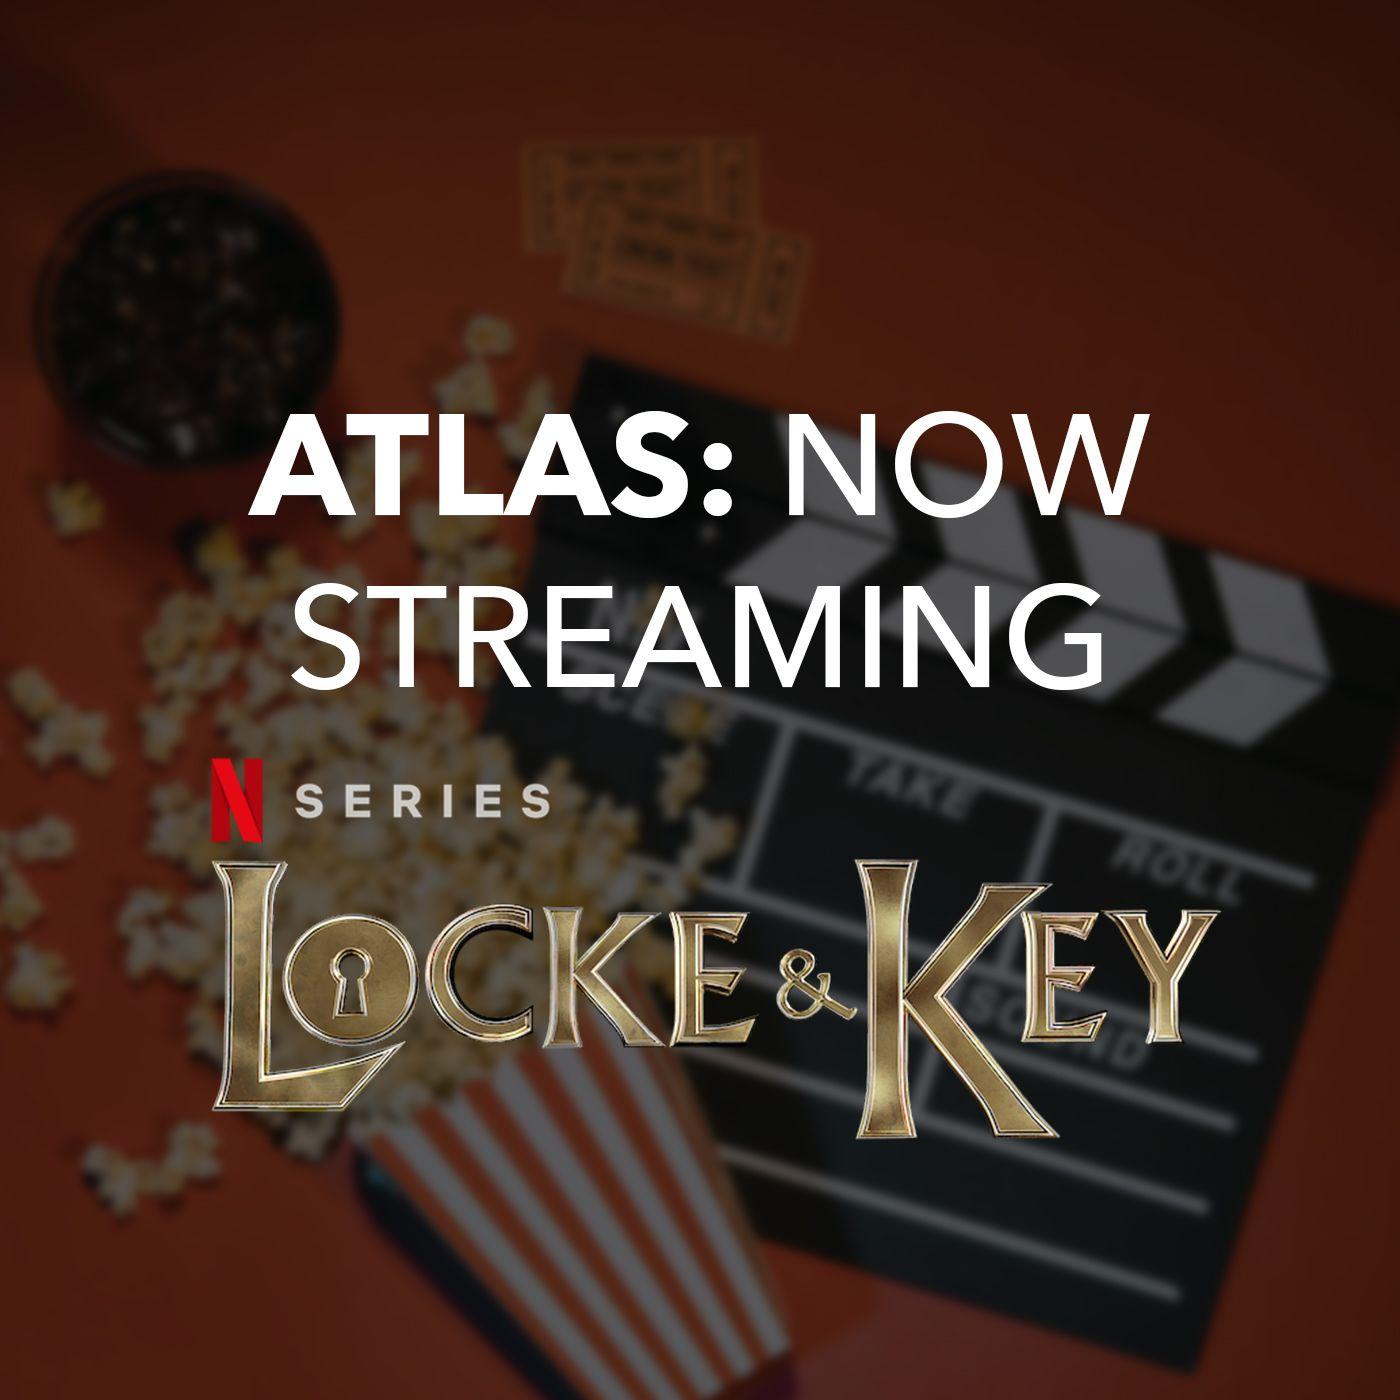 Locke & Key - Atlas: Now Streaming Episode 56